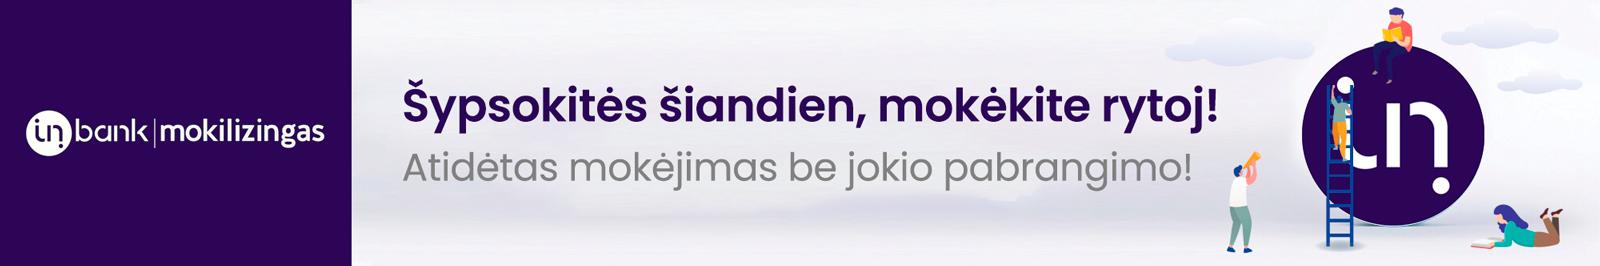 goc-moki-lizingas-banner